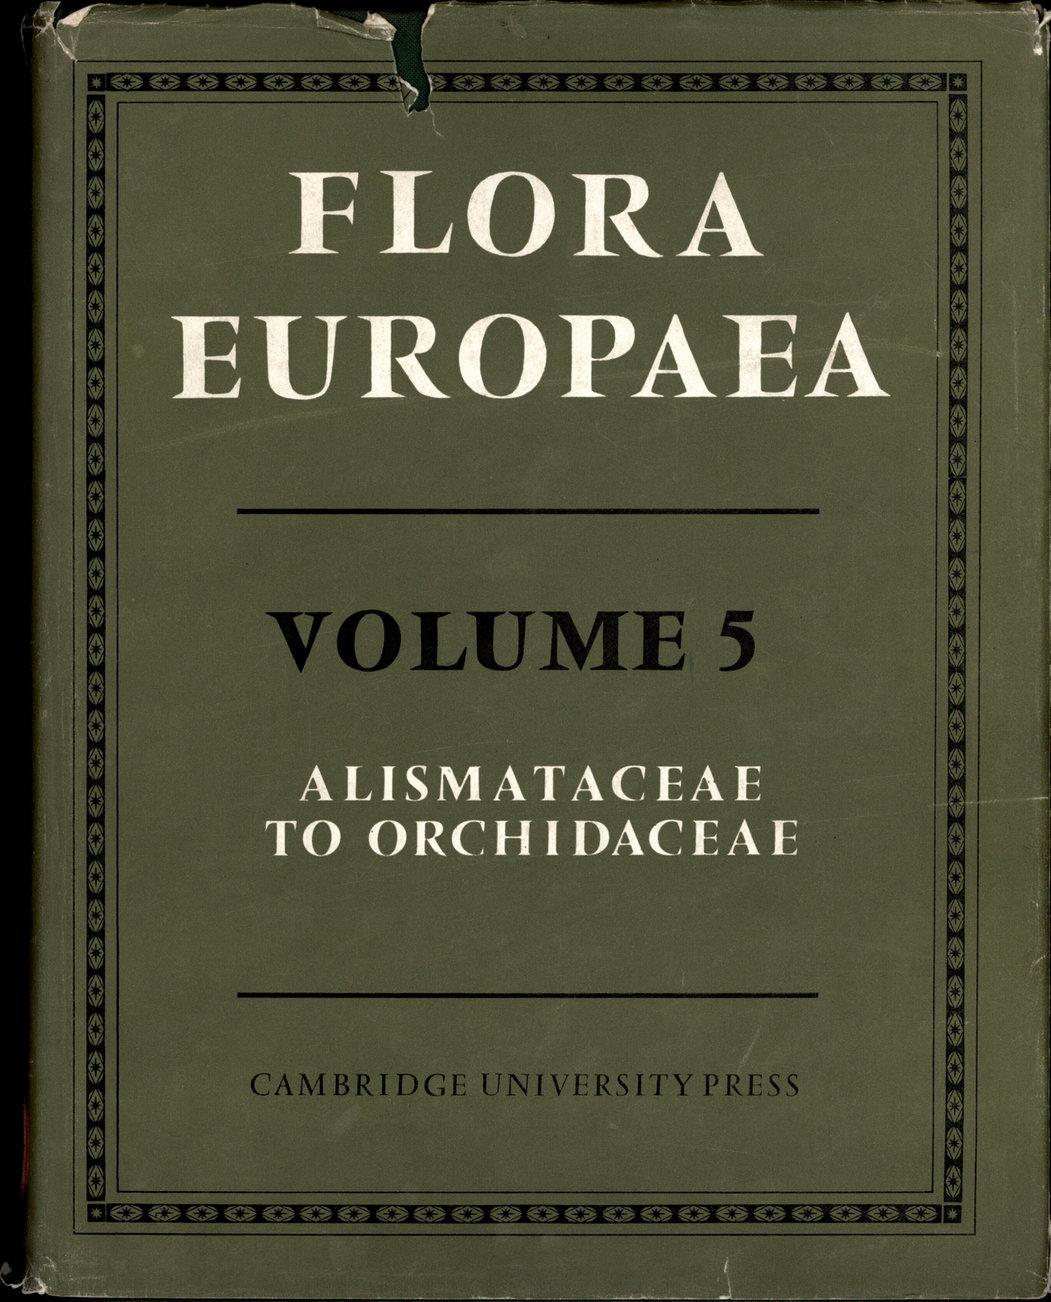 FLORA EUROPAEA VOLUME 5